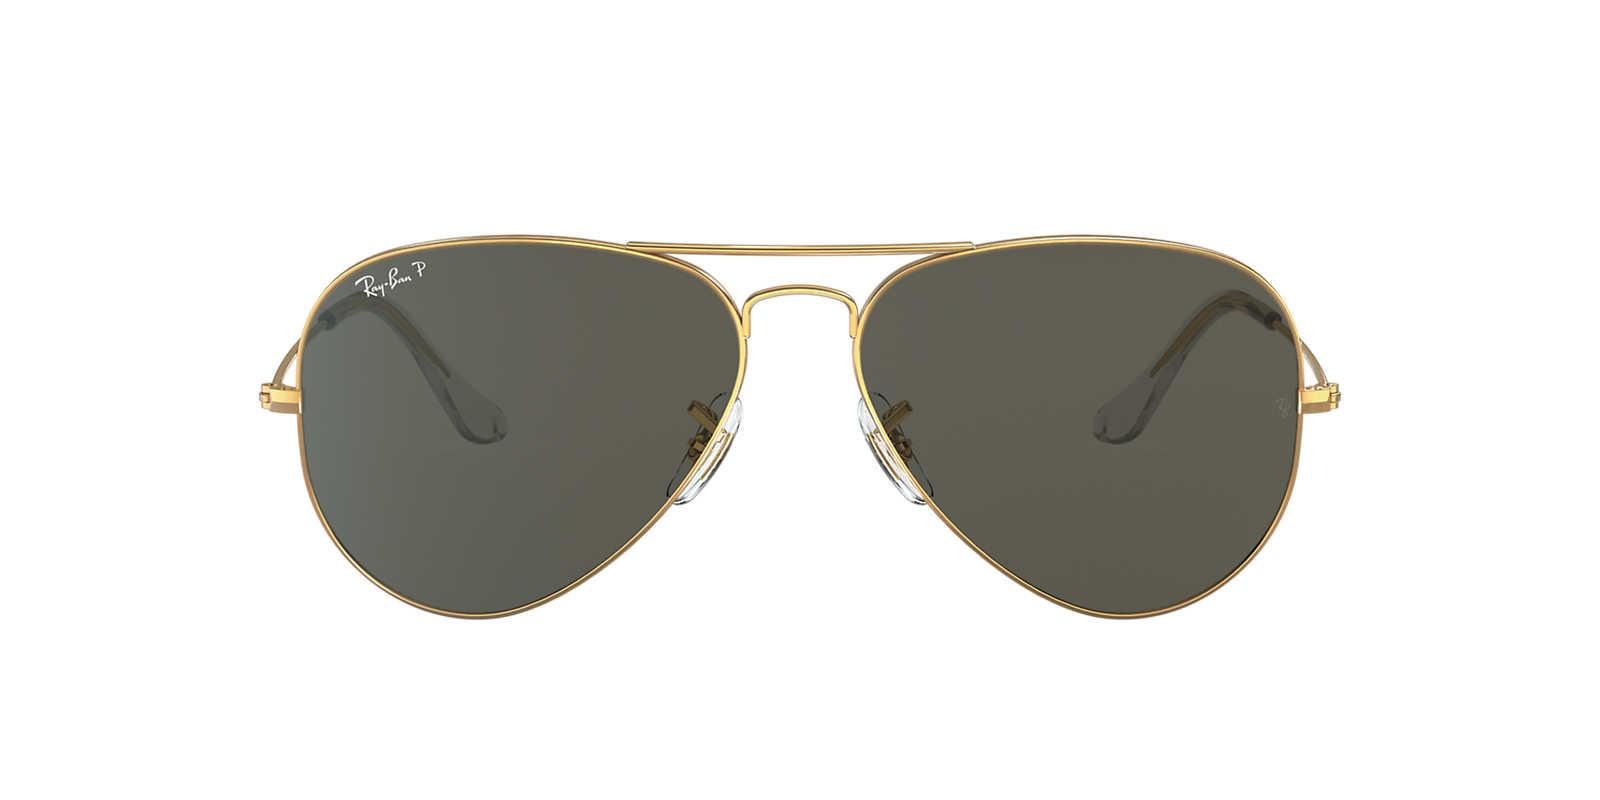 sunglasses brands list tzrf  RB3025 55 ORIGINAL AVIATOR